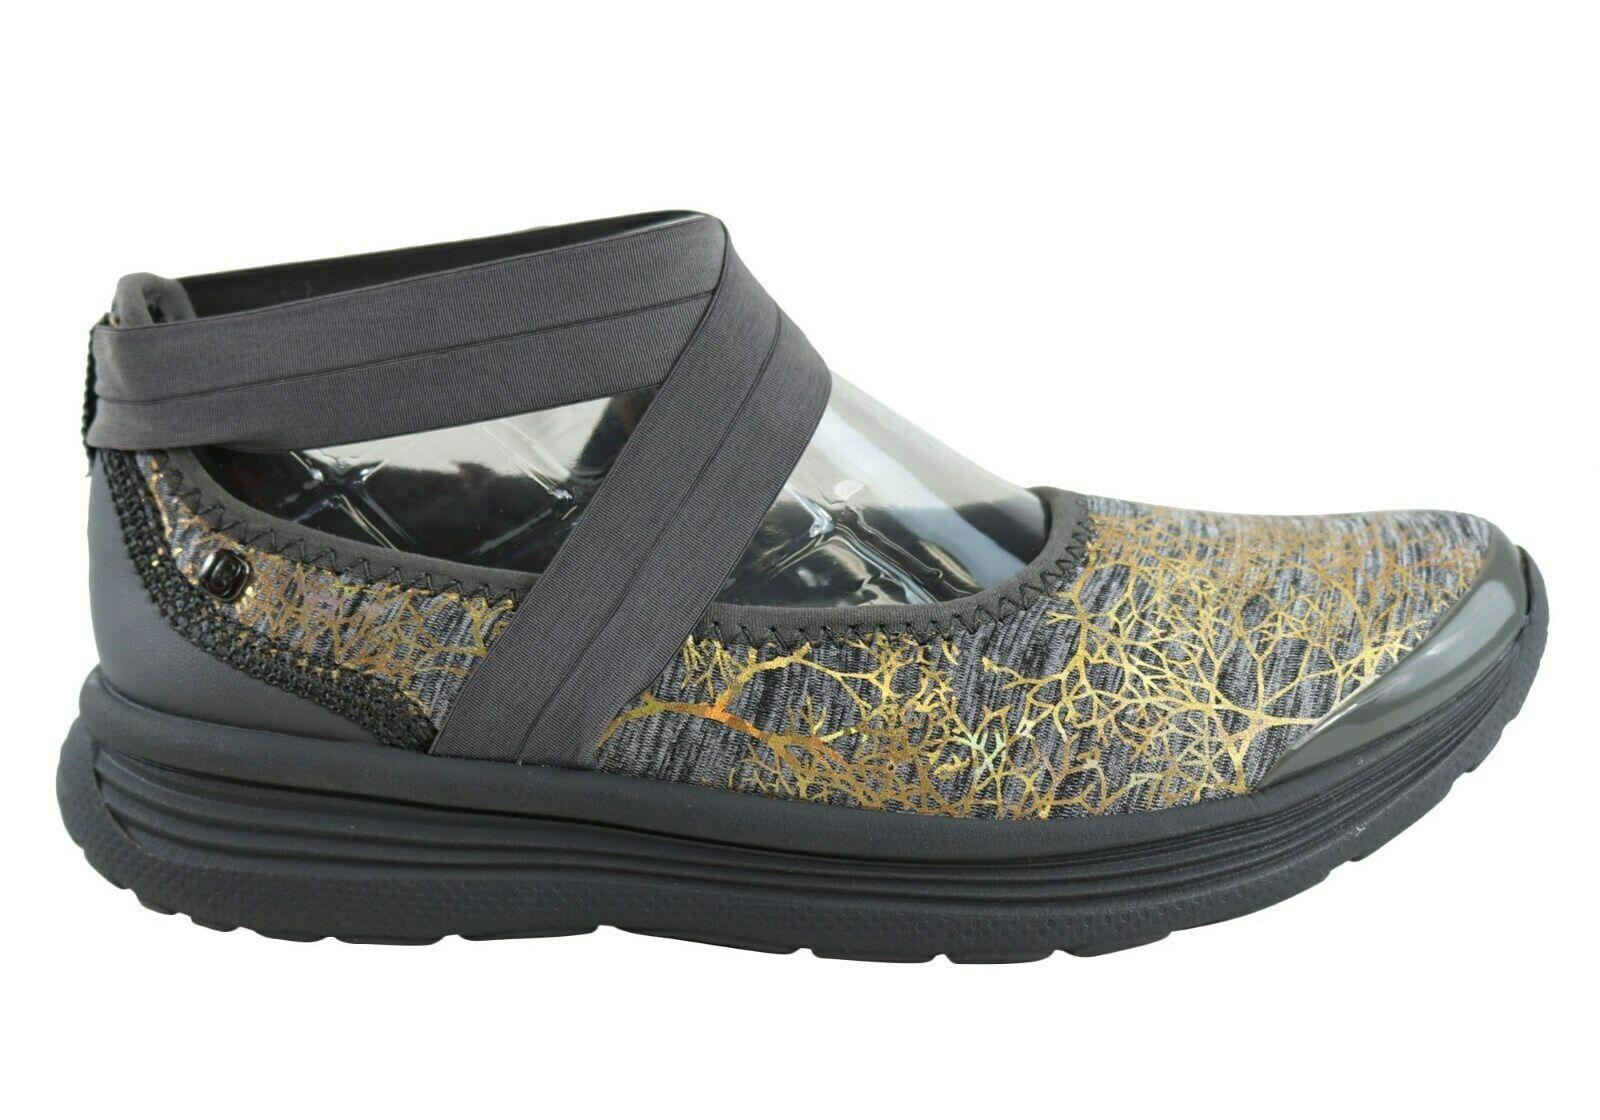 e2f0bacafee18c Naturalizer Casual Shoe  3 listings